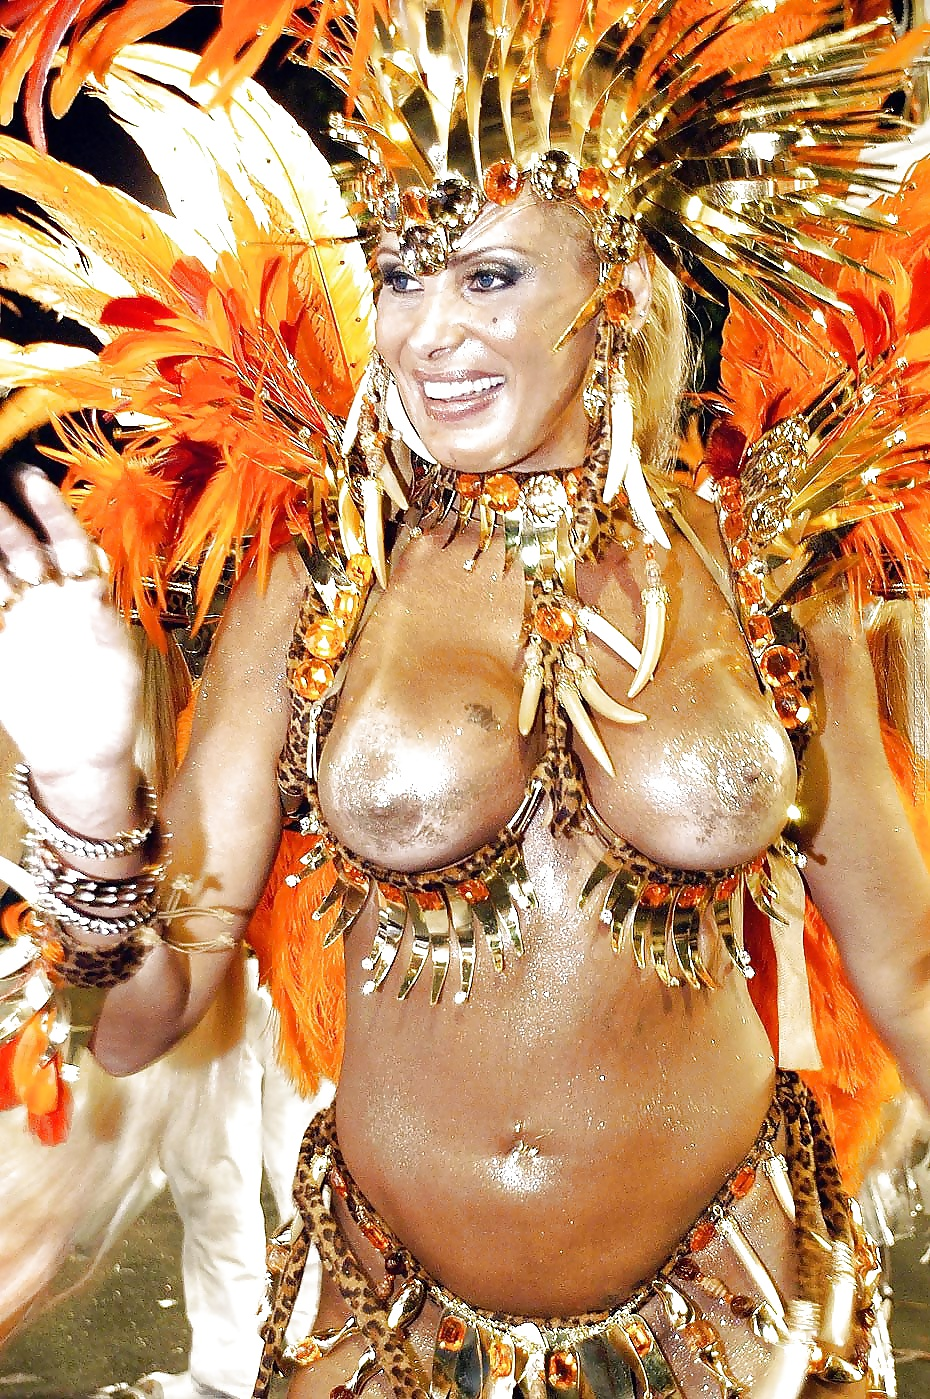 karnaval-transseksualov-video